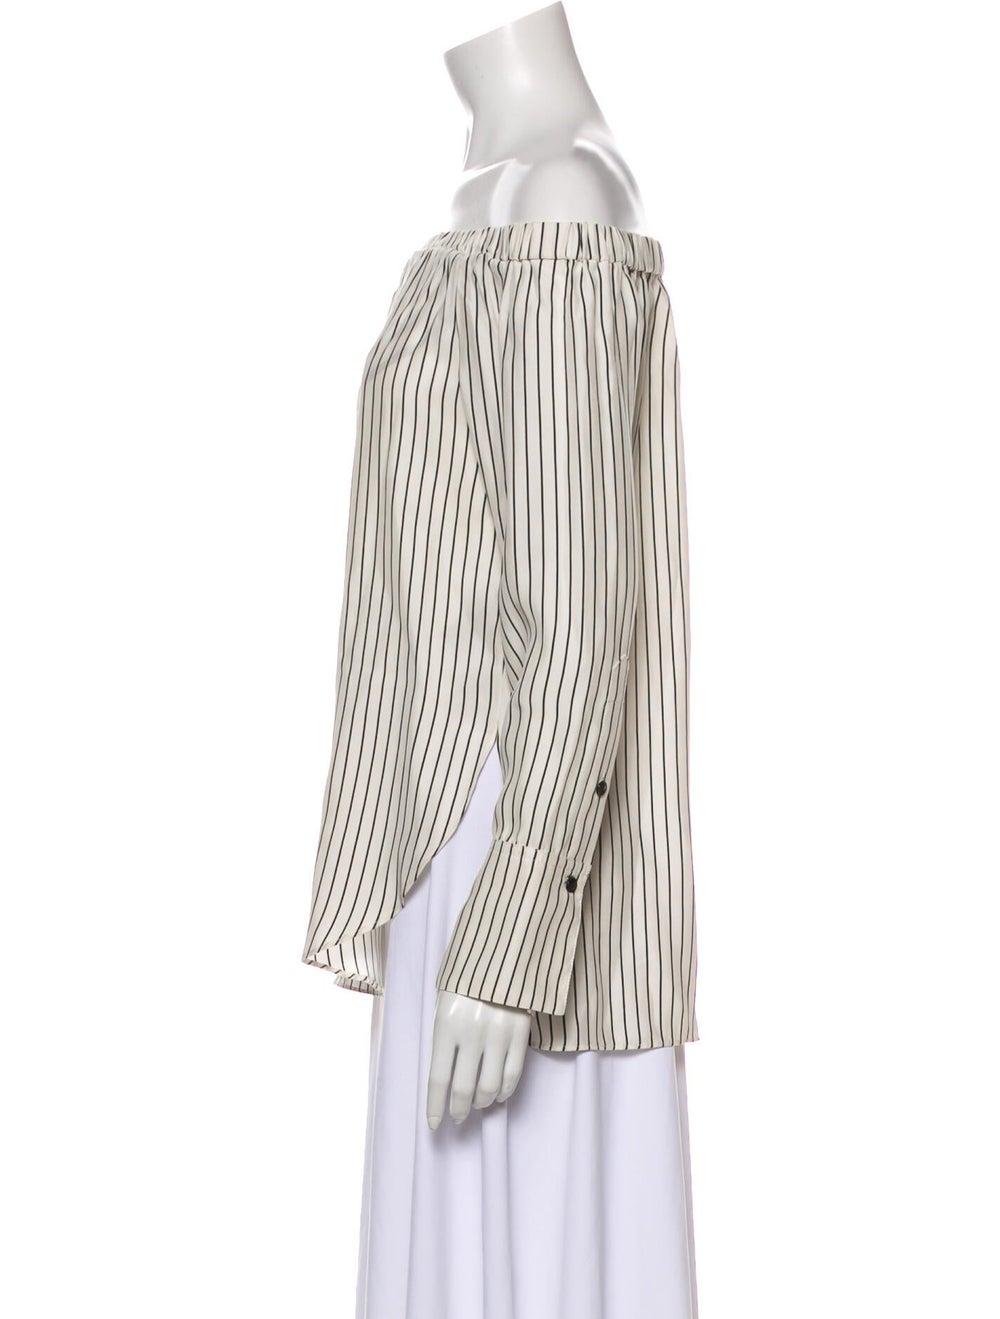 Rag & Bone Silk Striped Blouse - image 2